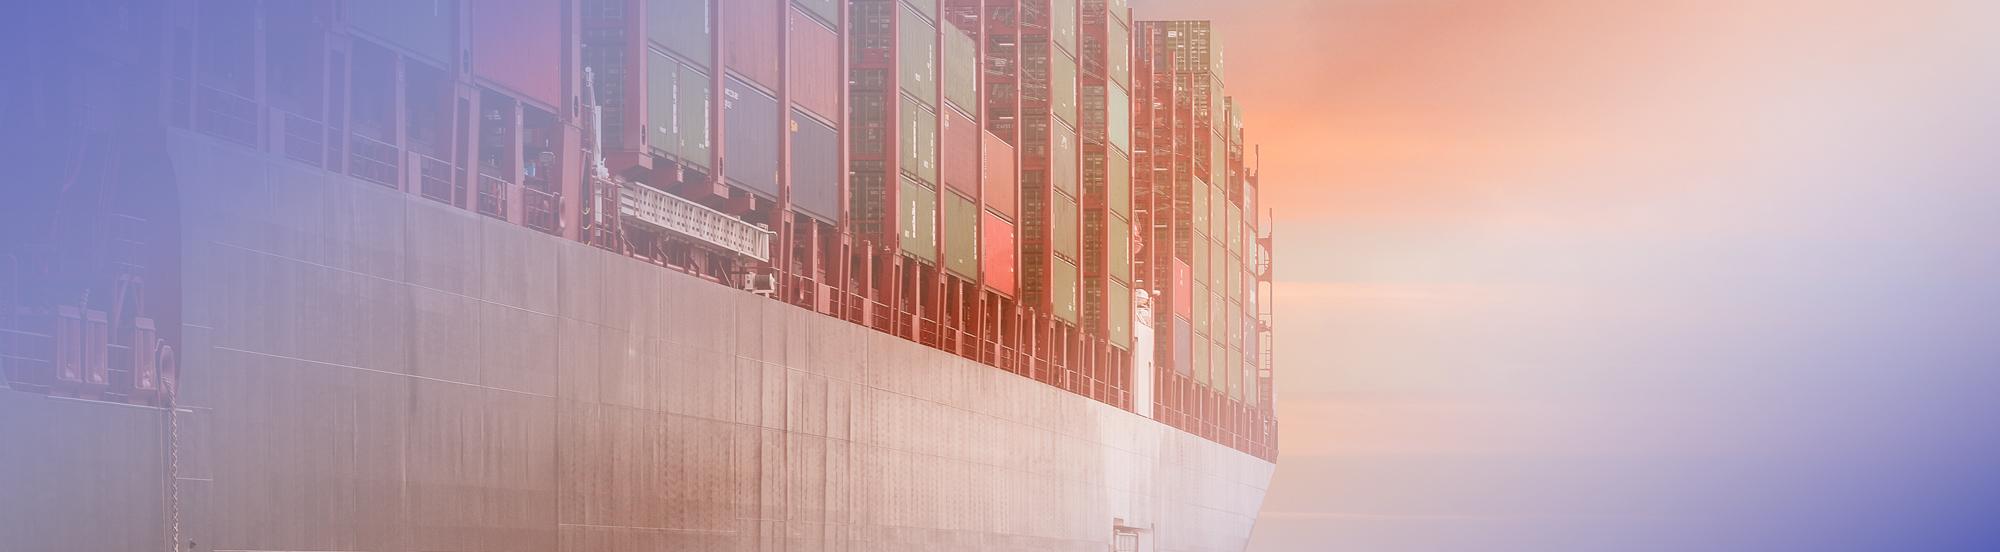 cargo-marine insurance